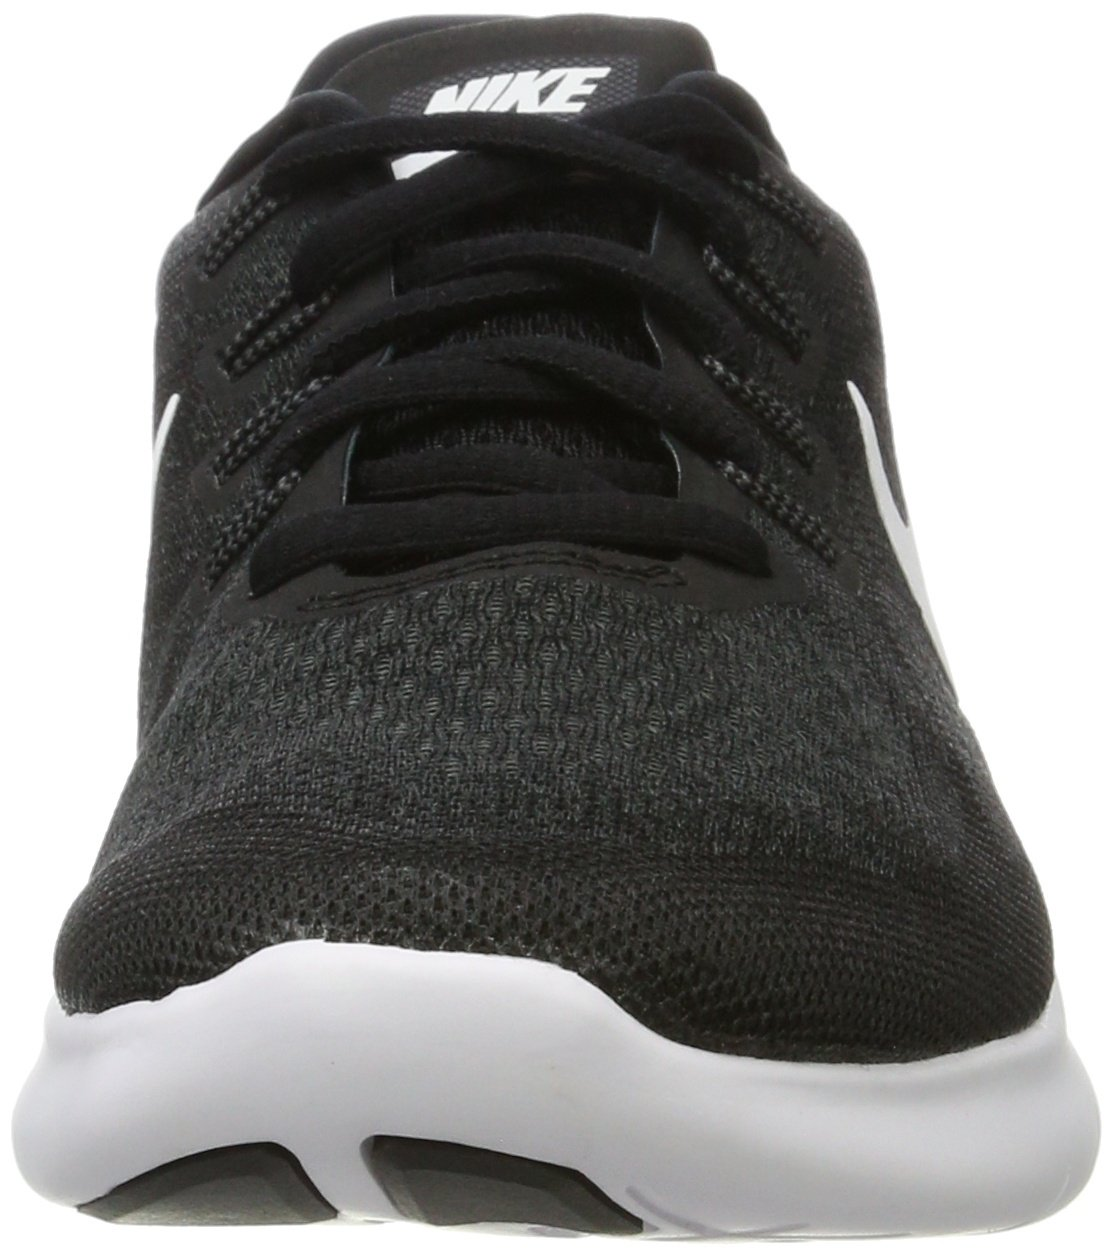 Nike Free Rn 2017, Scarpe Running Uomo, MultiColoreeee (nero bianca bianca bianca Dark grigio Anthracite), 43 EU | Ben Noto Per Le Sue Belle Qualità  | Maschio/Ragazze Scarpa  f95a2d